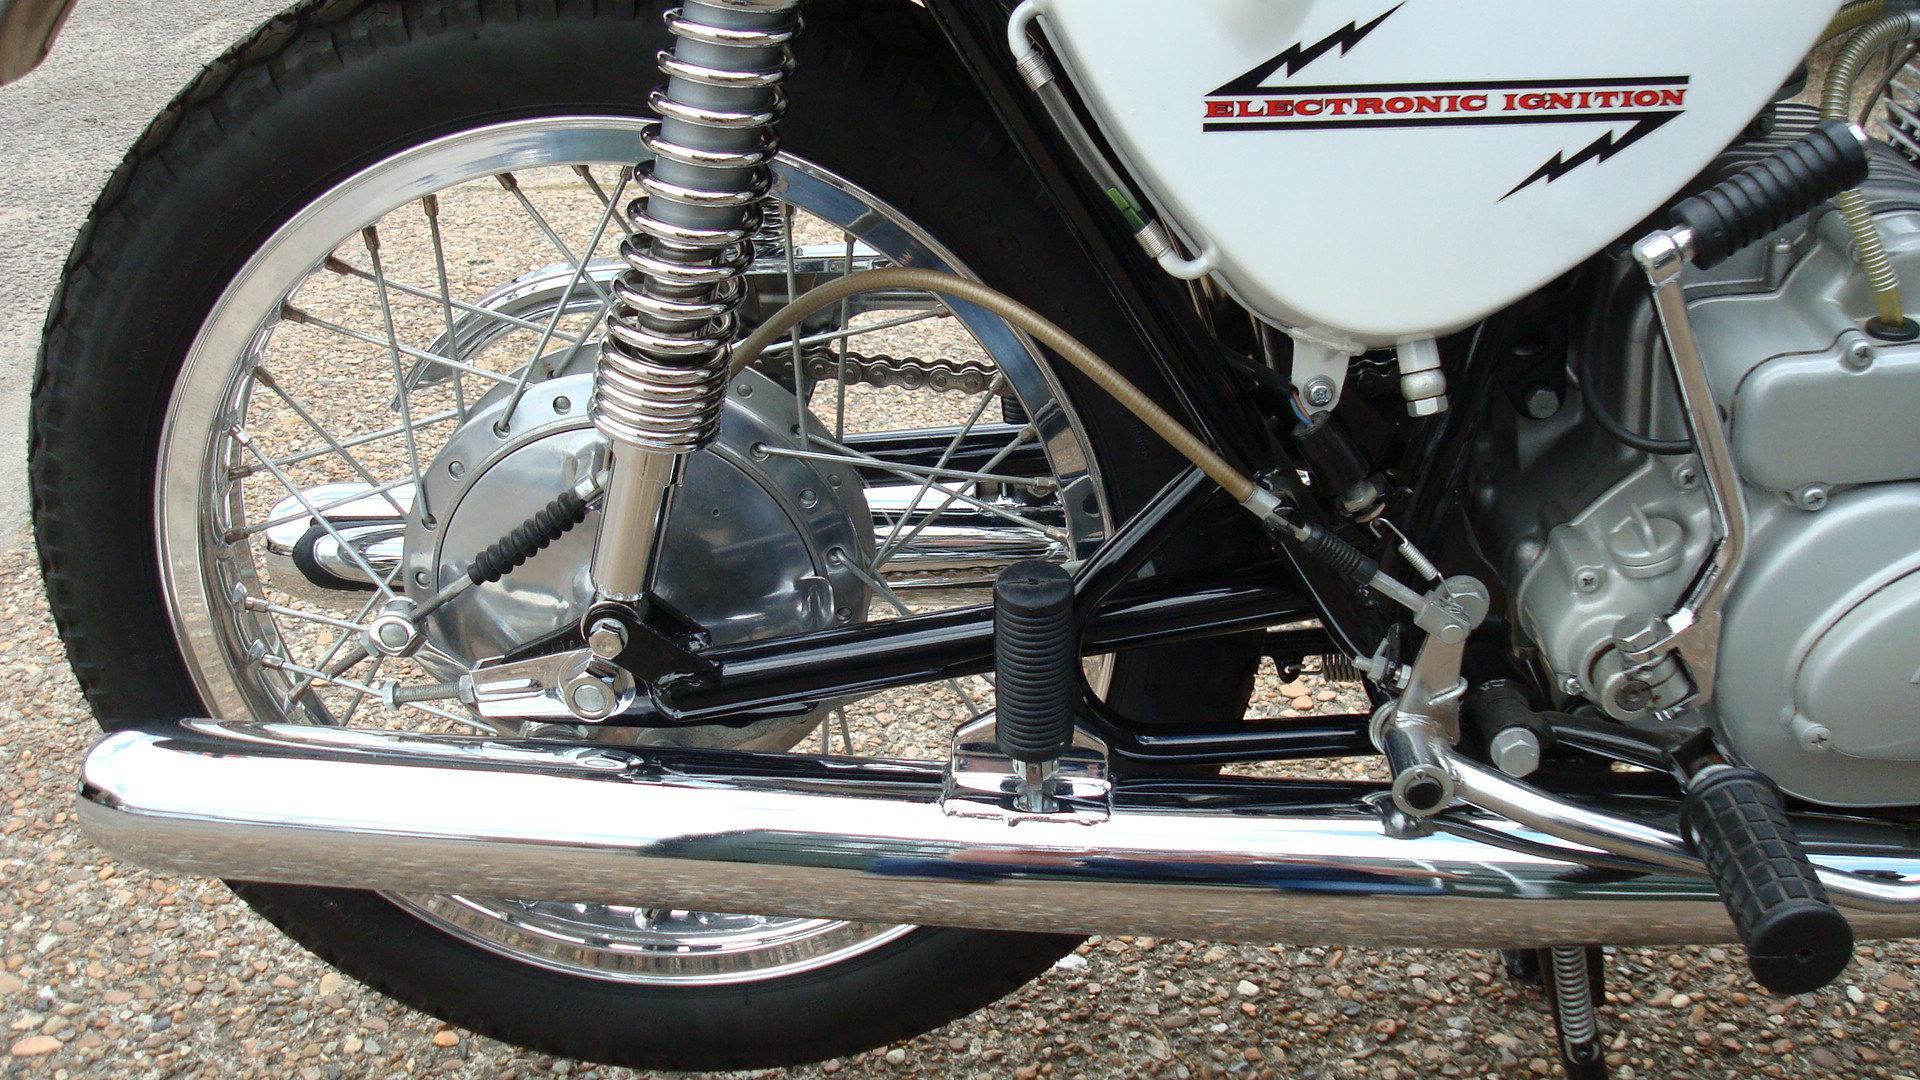 Kawasaki A1A Samurai 250 1970-J **SHOW STANDARD,RESTORED** For Sale (picture 5 of 10)